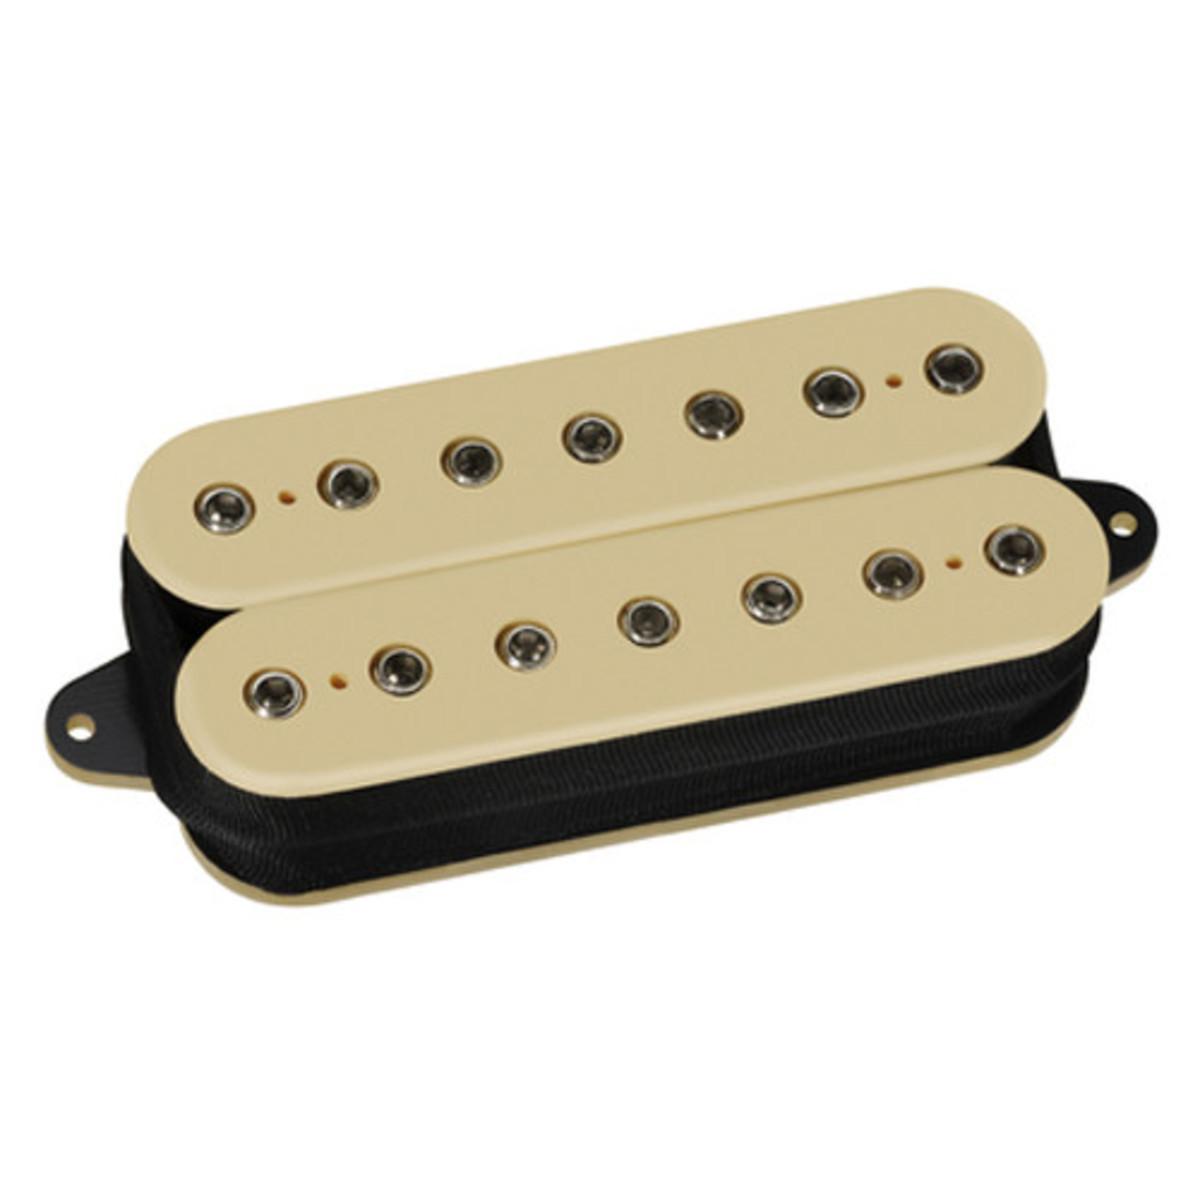 dimarzio dp707 liquifire 7 string humbucker guitar pickup cream at gear4music. Black Bedroom Furniture Sets. Home Design Ideas